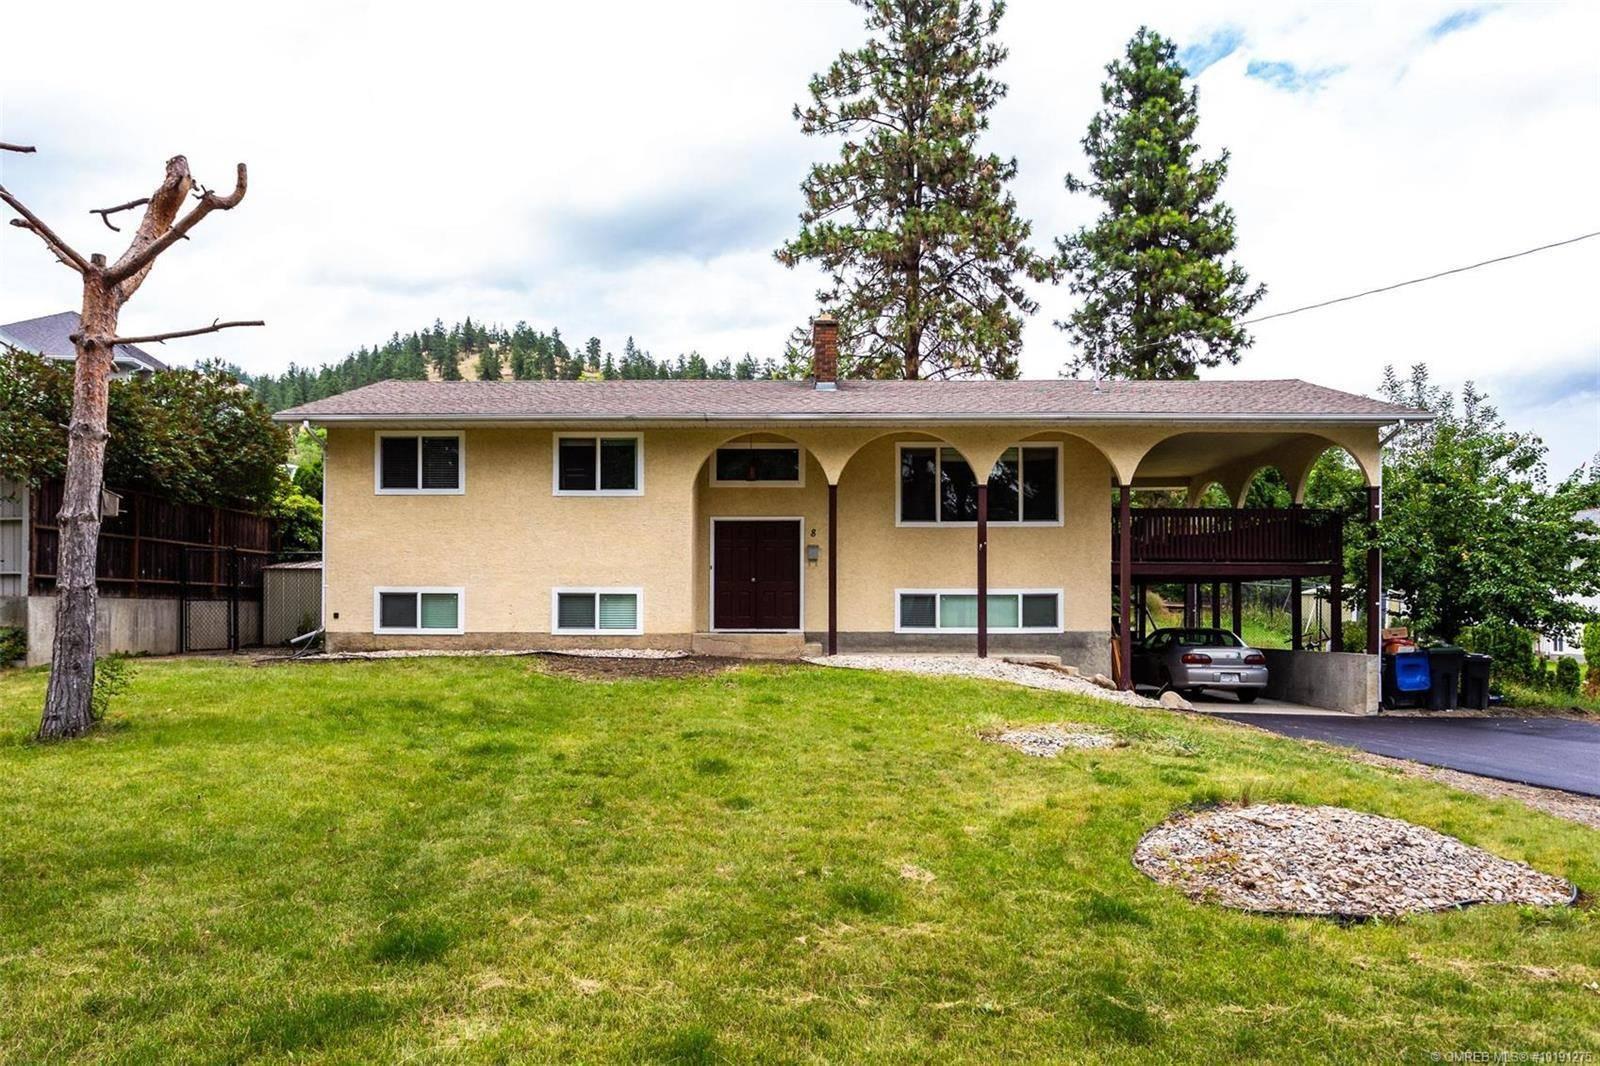 House for sale at 8 Caro Rd Kelowna British Columbia - MLS: 10191275